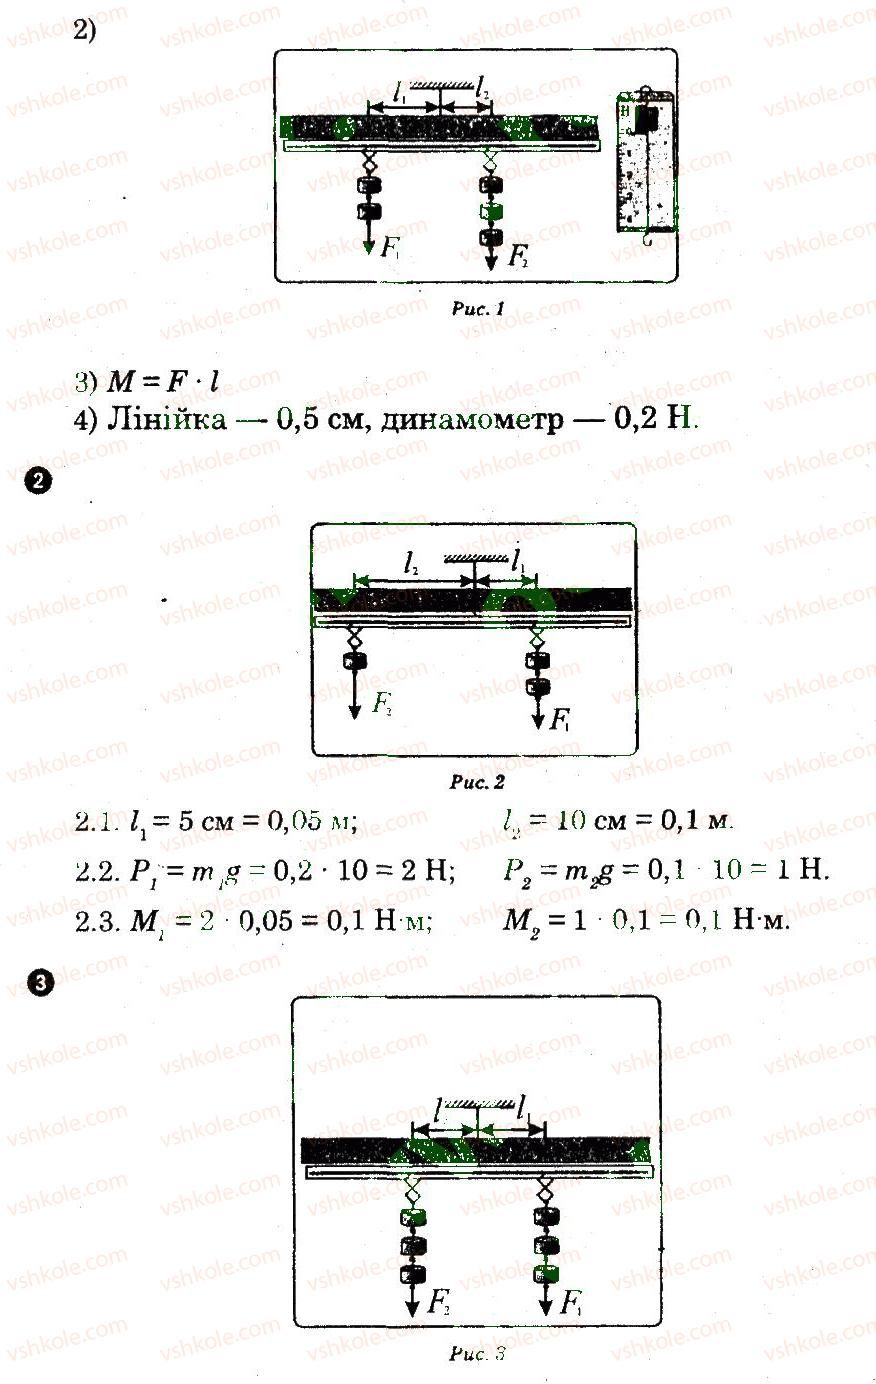 8-fizika-fya-bozhinova-oo-kiryuhina-2010-zoshit-dlya-laboratornih-robit--laboratorni-roboti-8-rnd6501.jpg